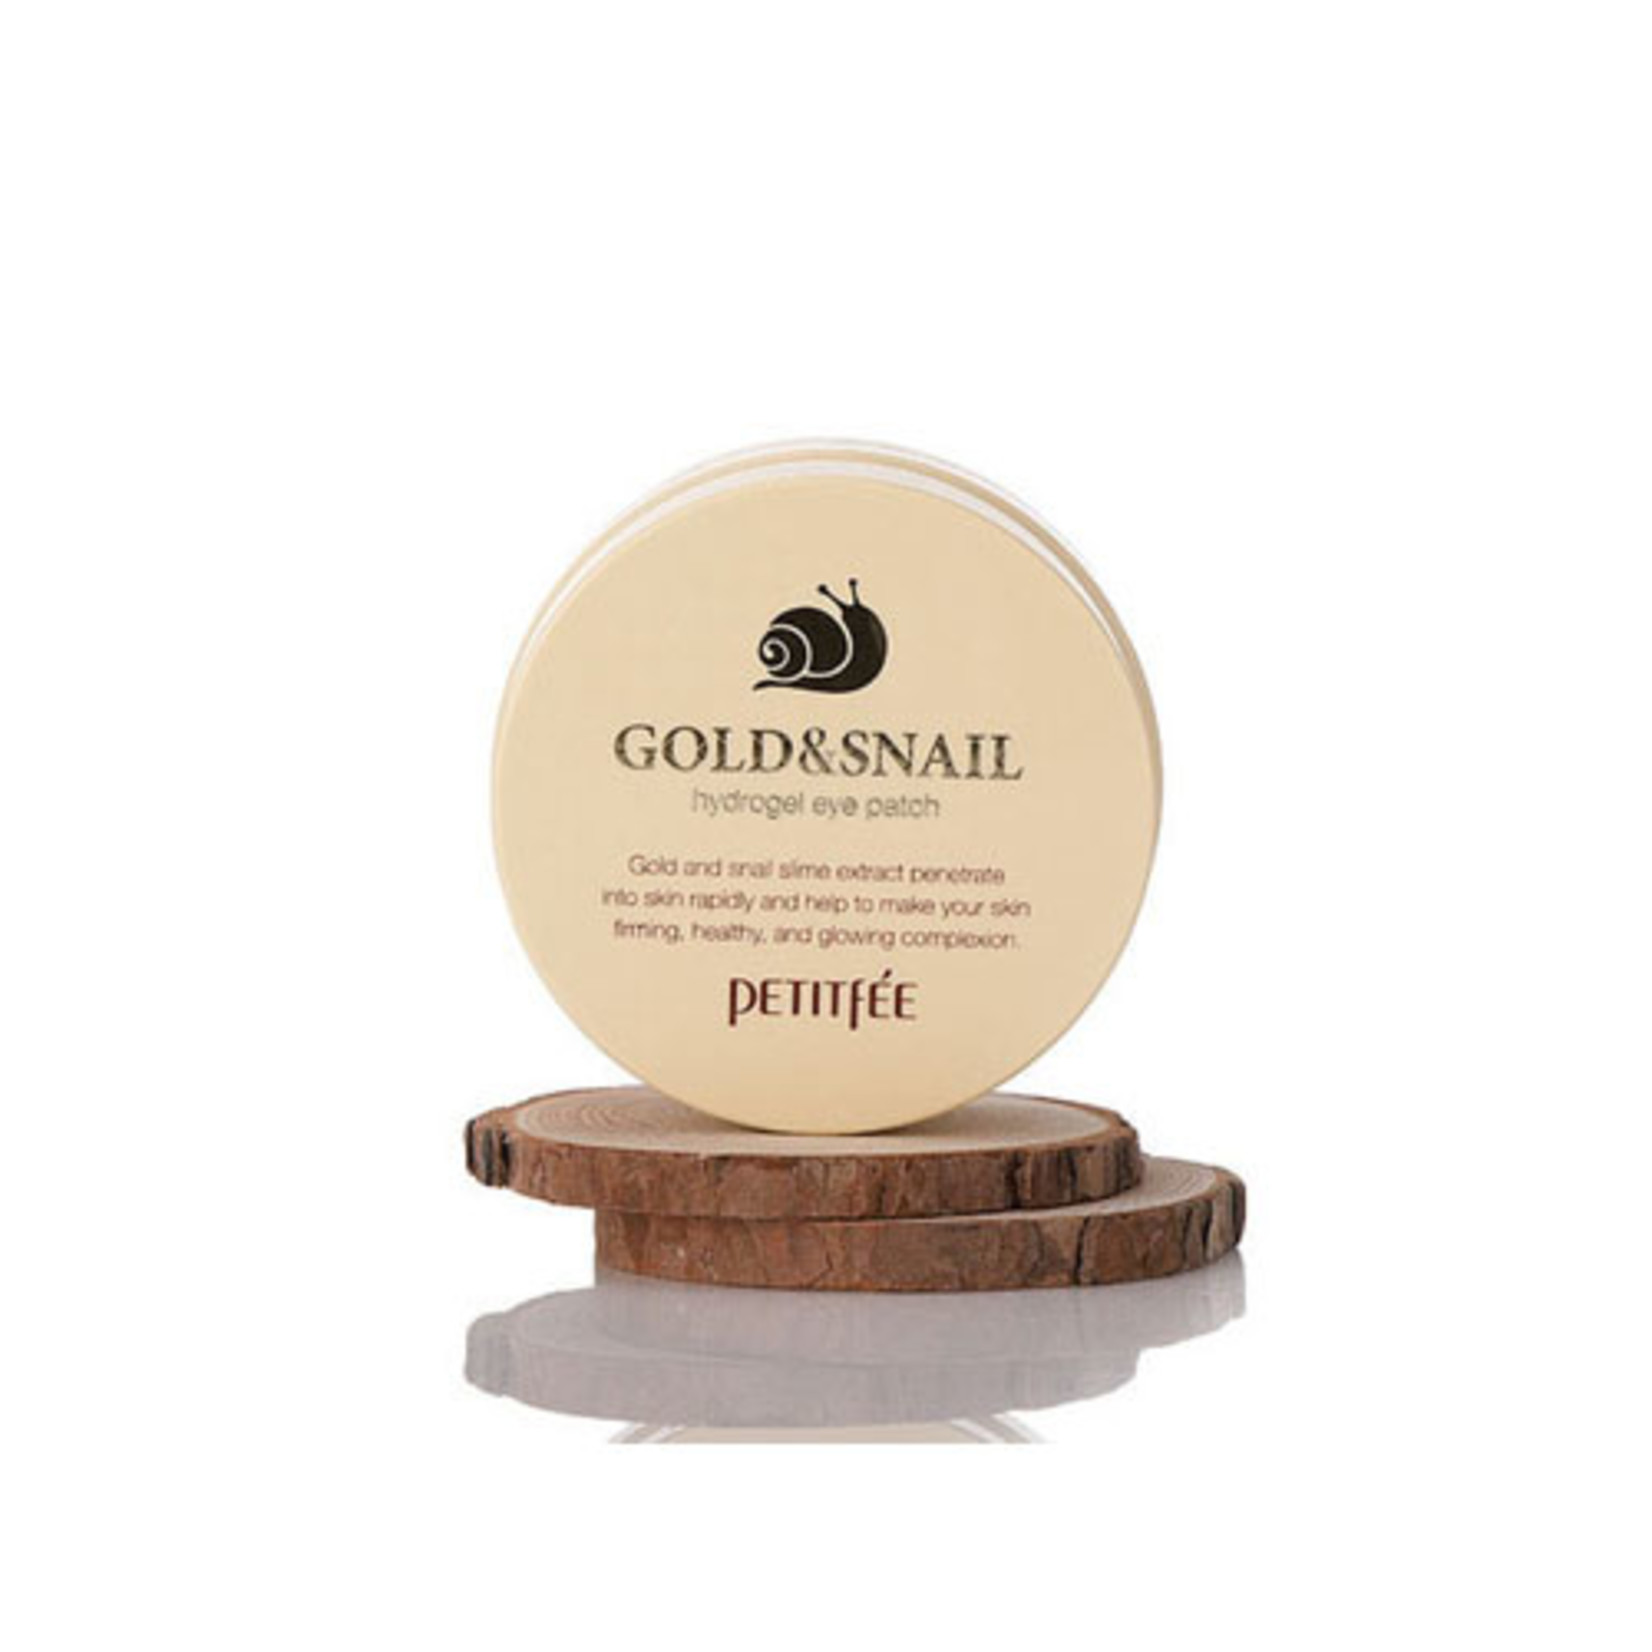 Petitfee Petitfee Gold & Snail Eye Patch